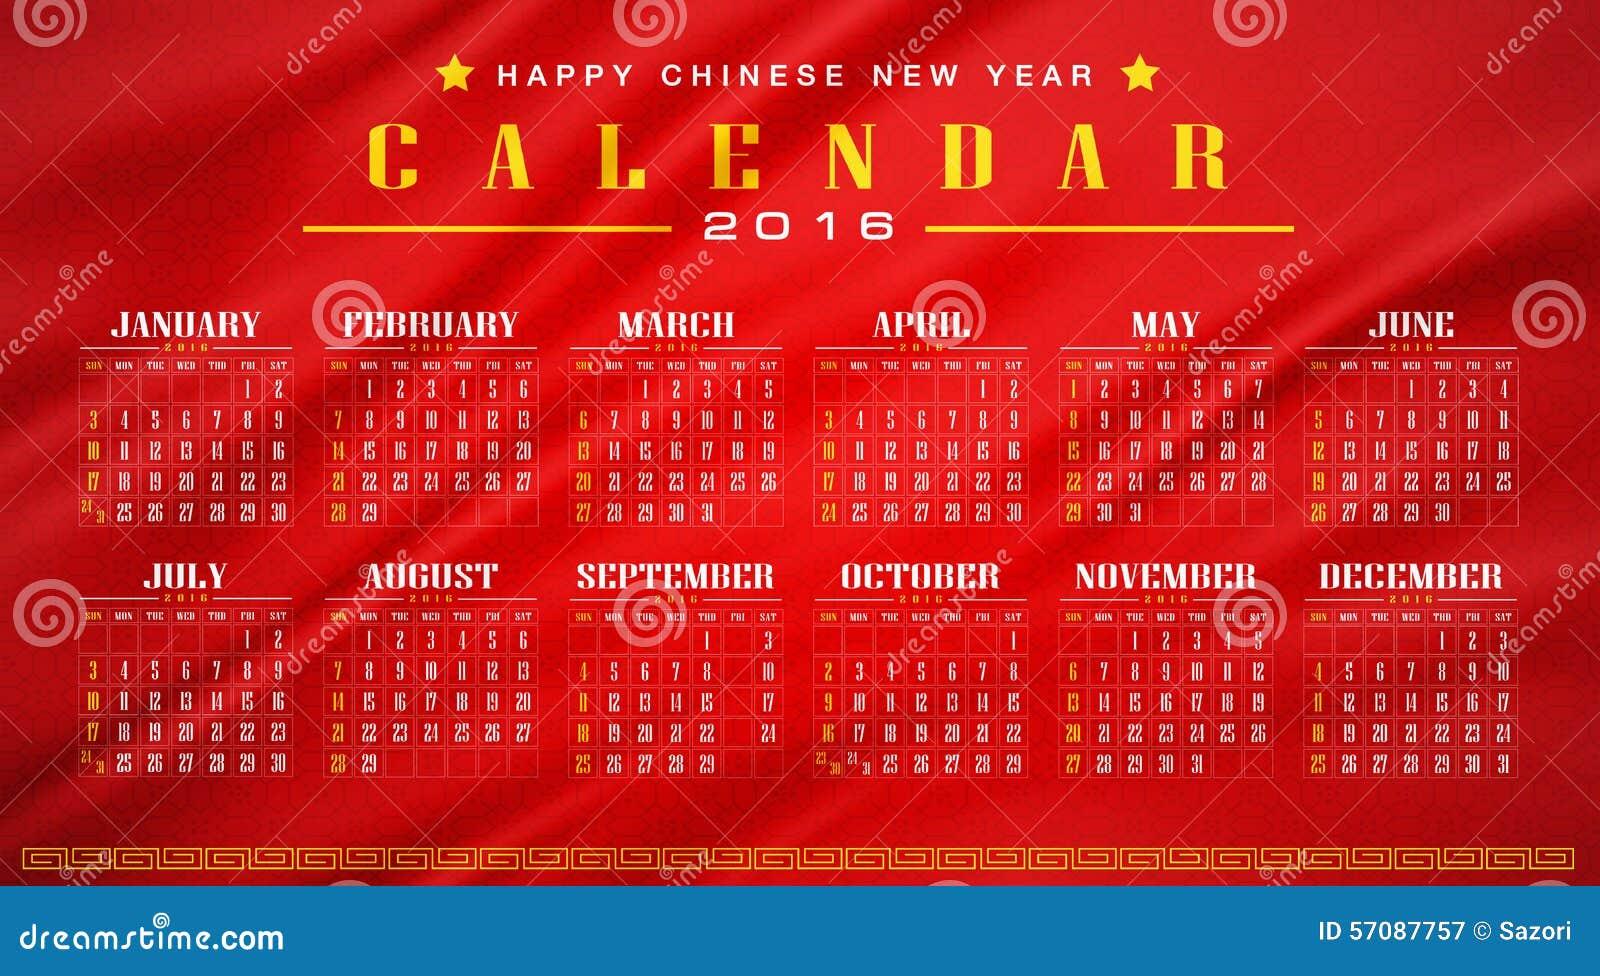 china chinesischer kalender 2016 stock abbildung bild 57087757. Black Bedroom Furniture Sets. Home Design Ideas